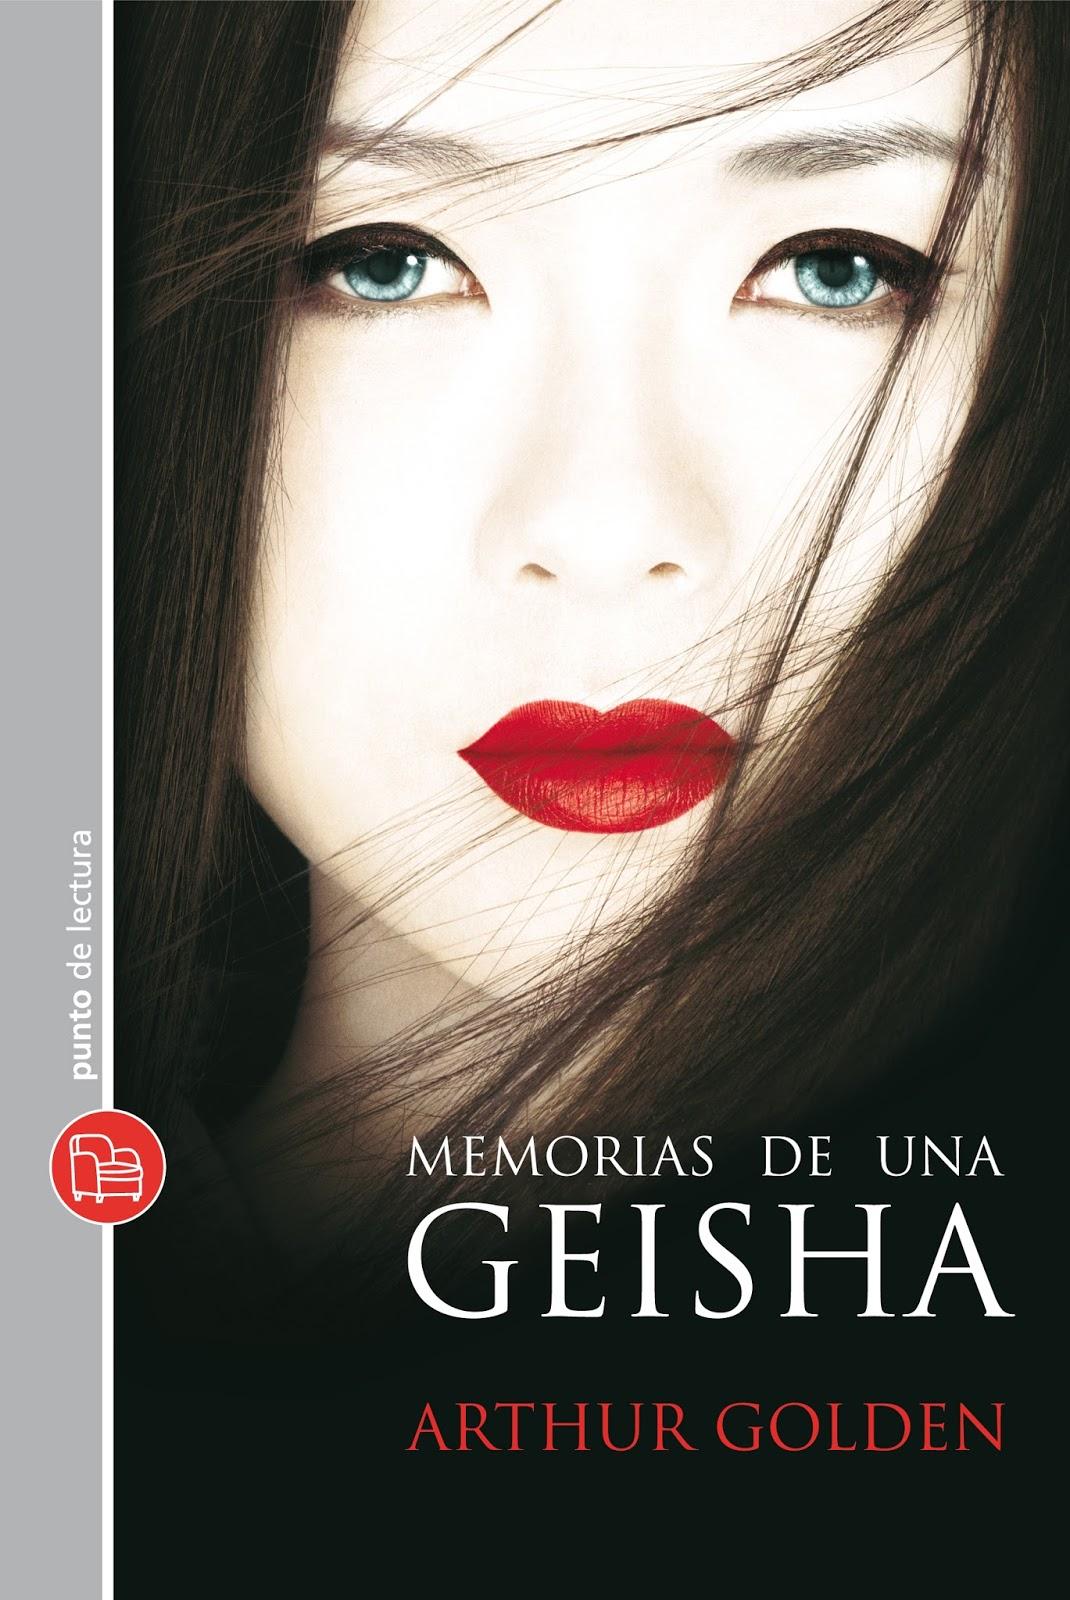 Memorias de una Geisha, de Arthur Golden